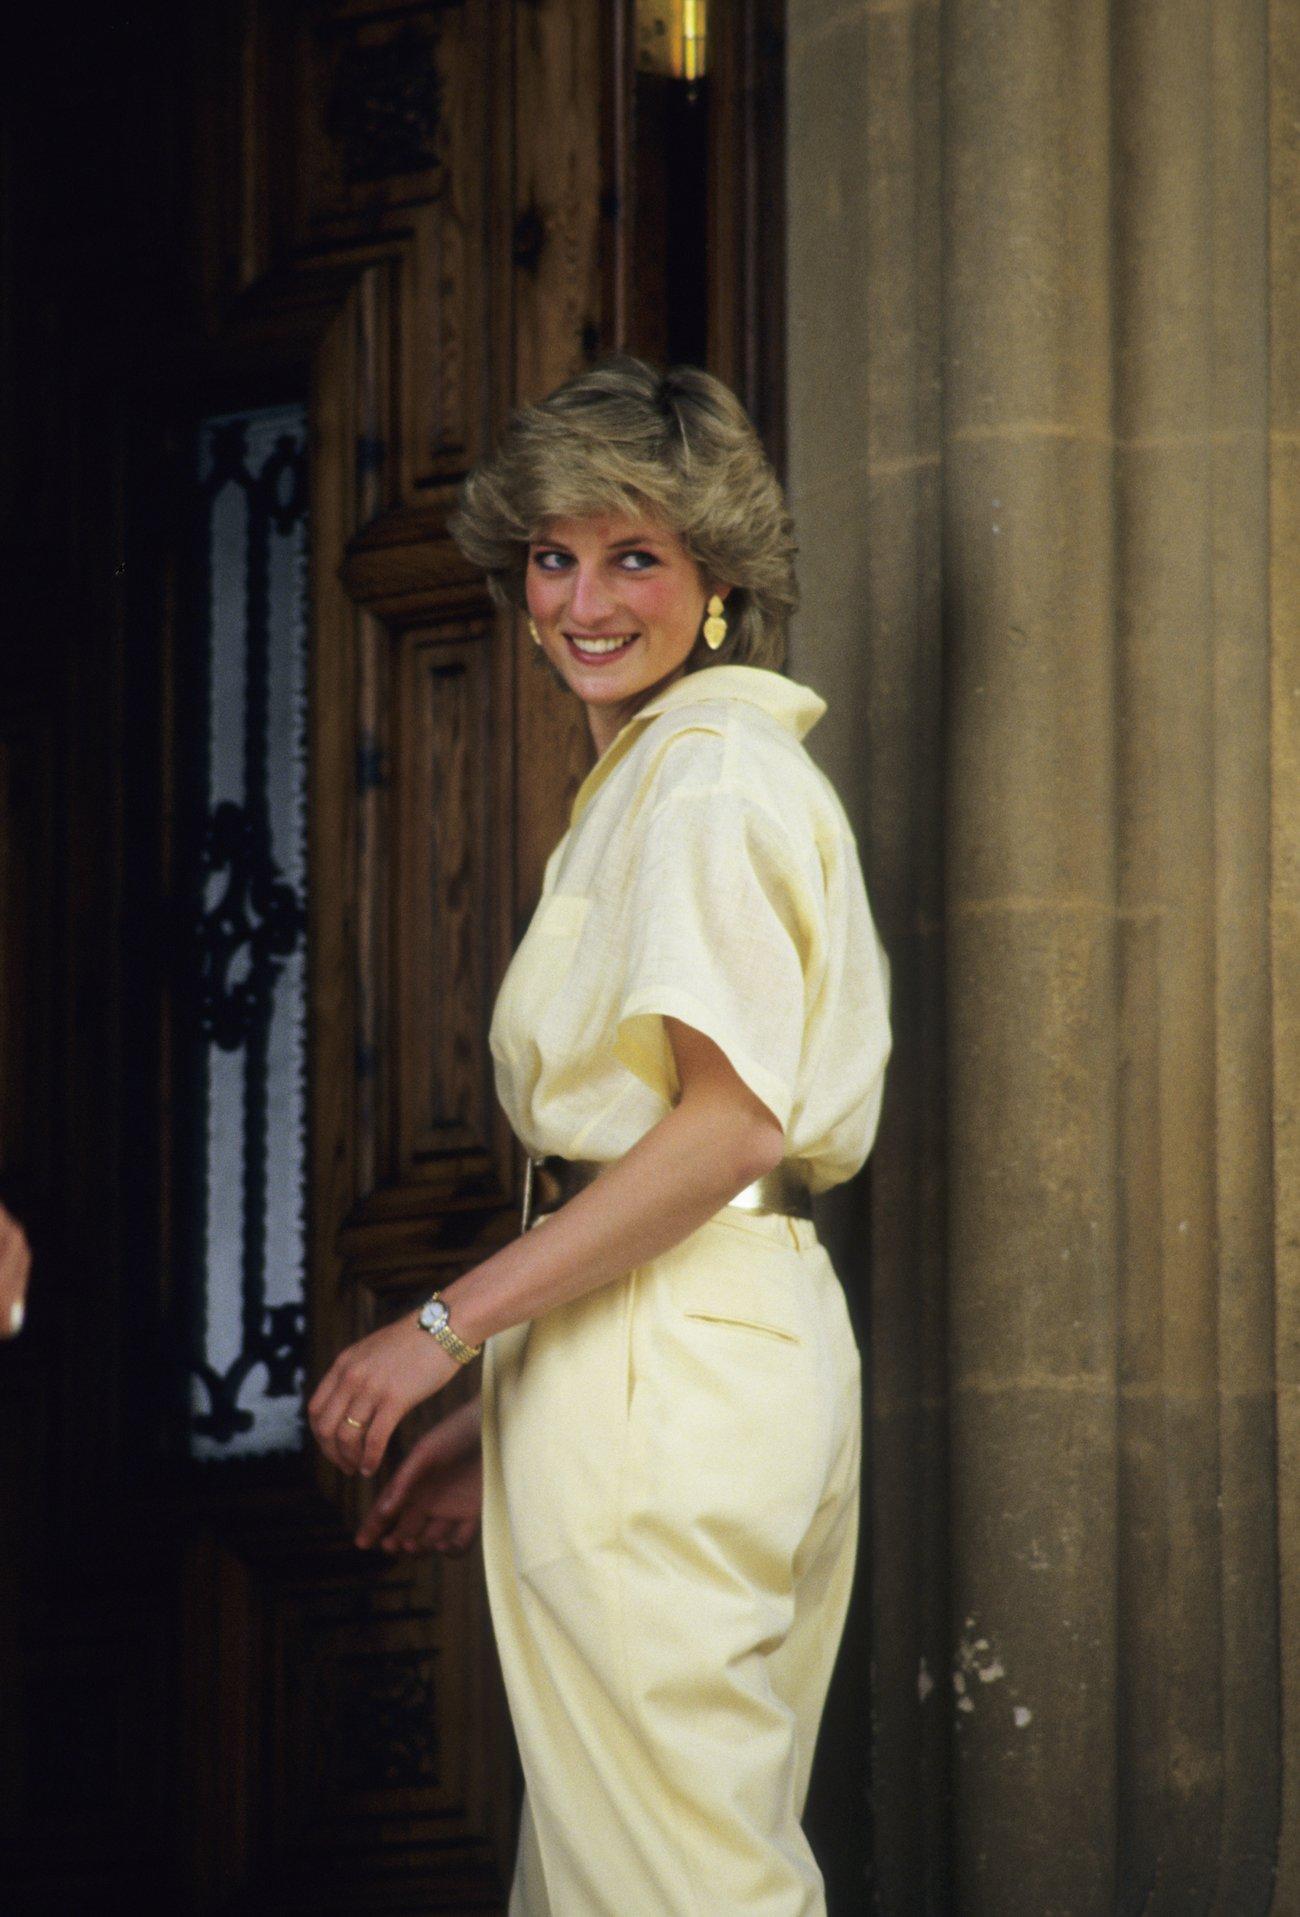 Diana-Blonde Prinzessin Diana